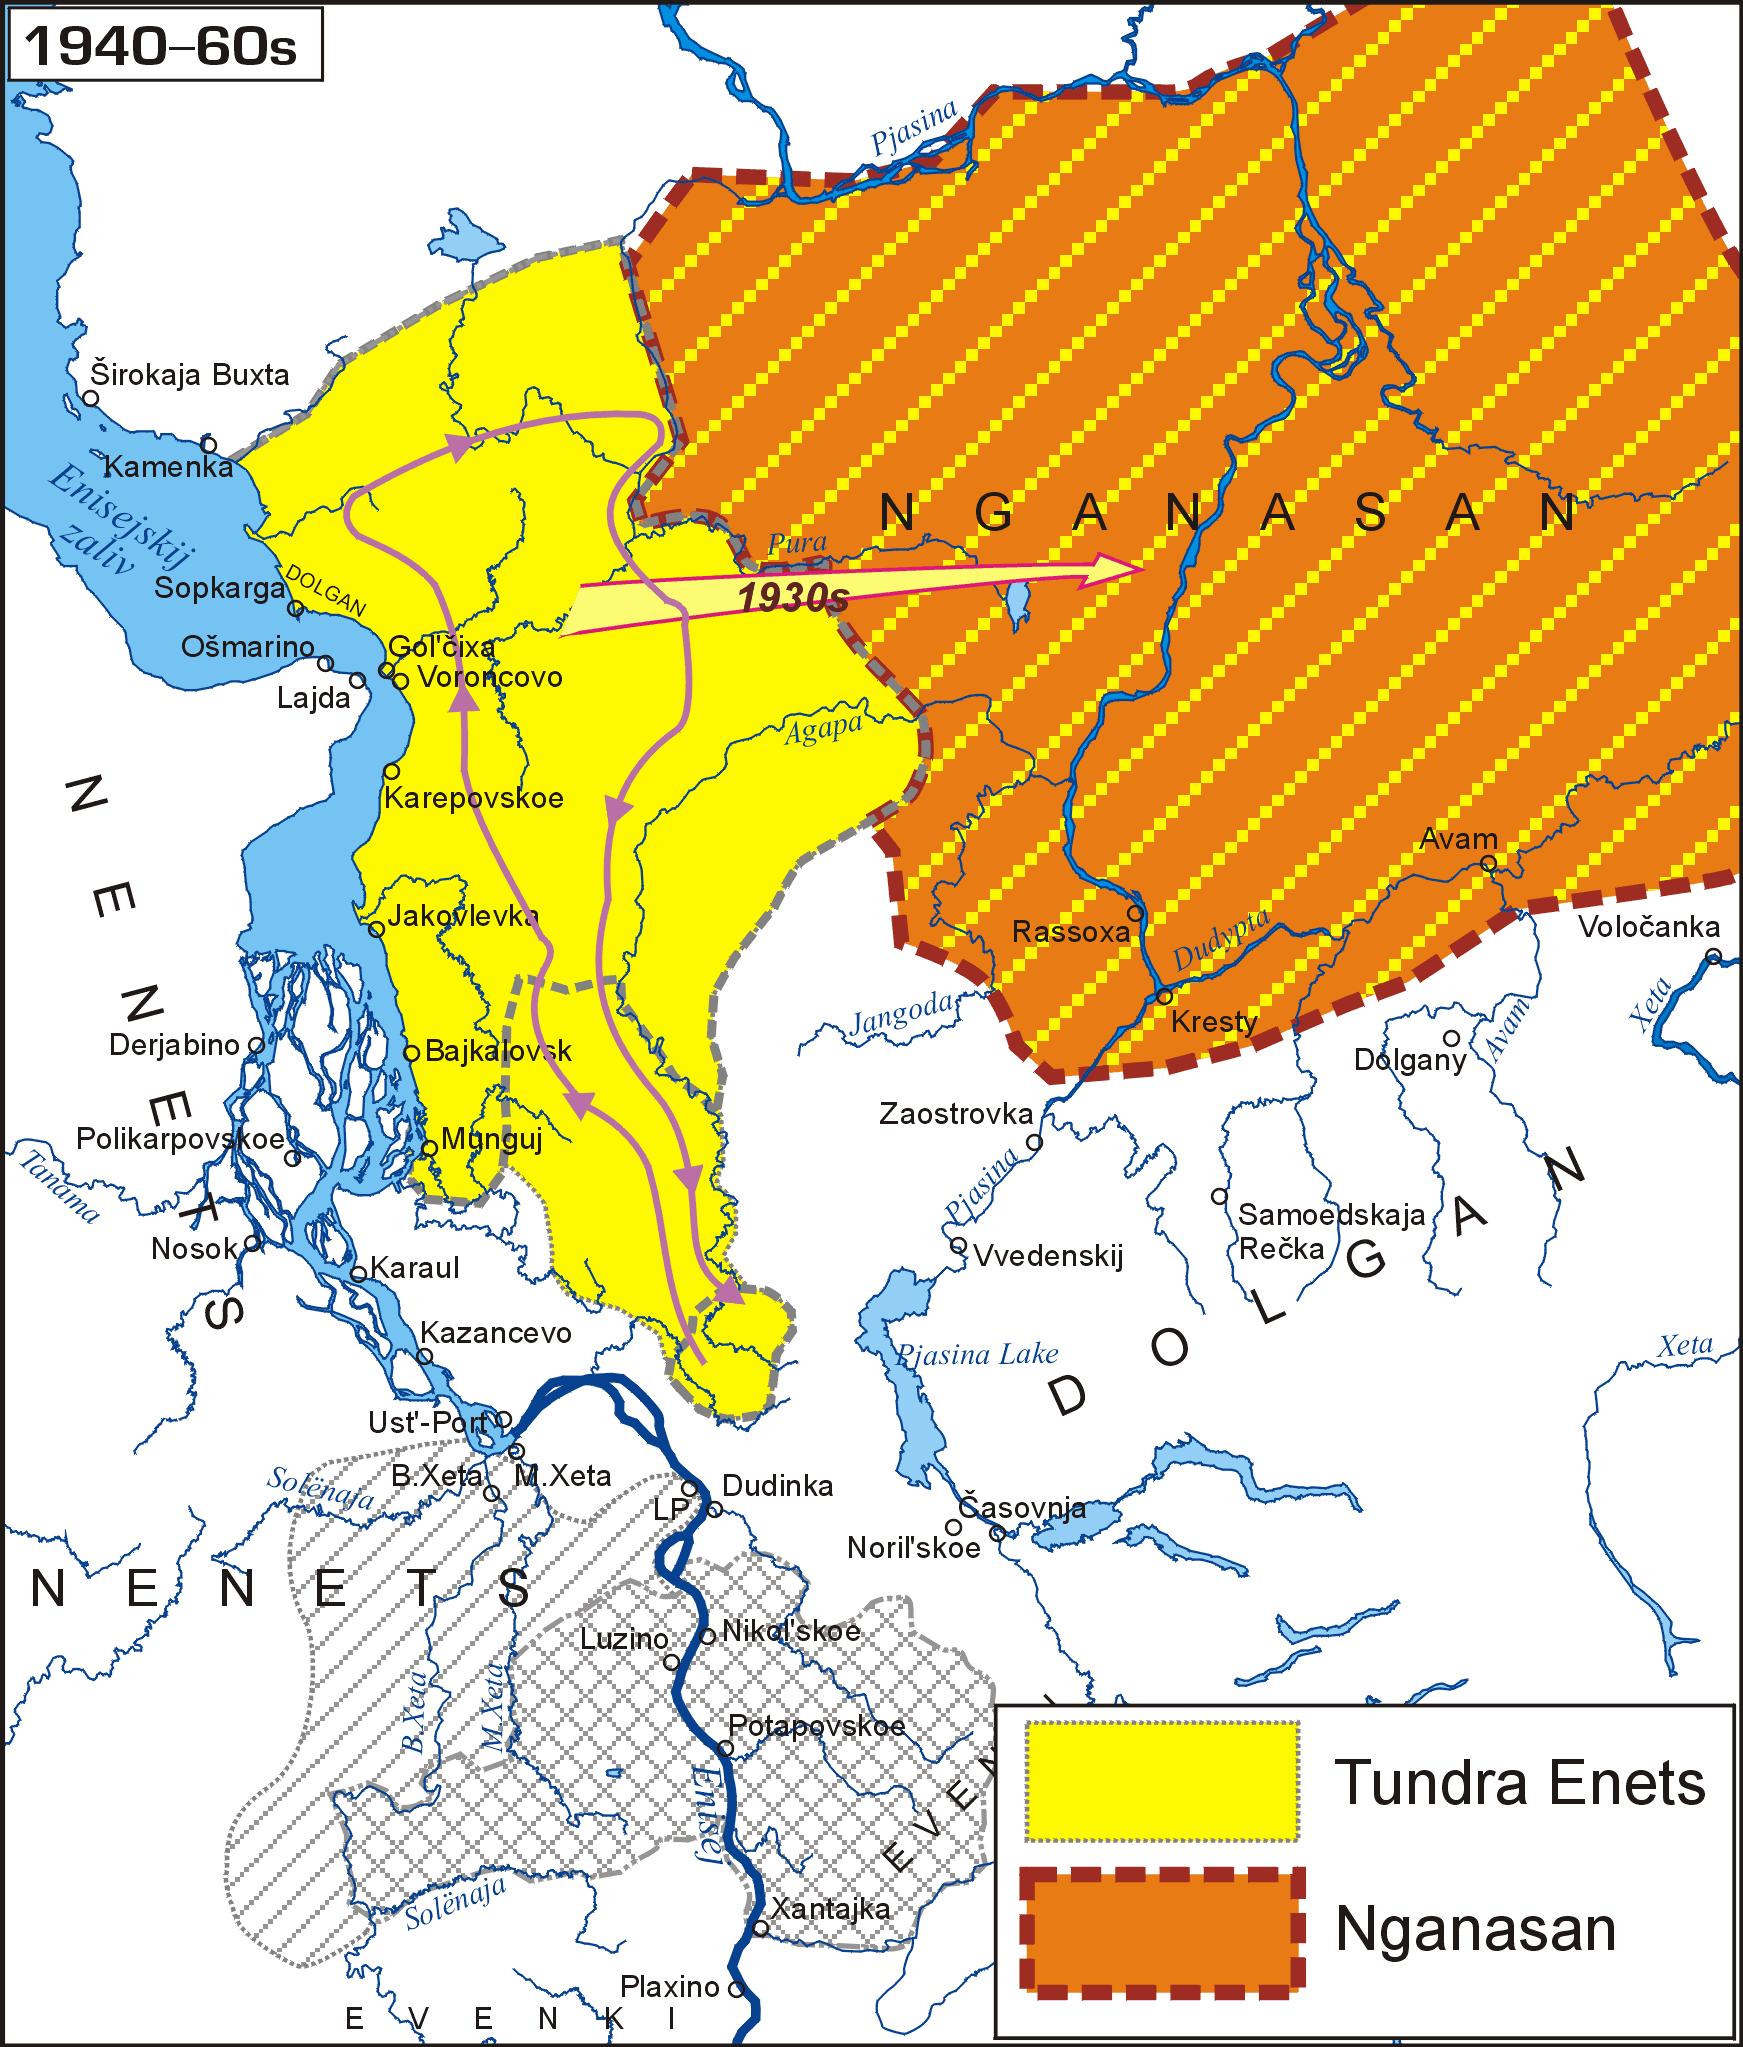 The Enets and the Nganasan languages (1940–60s); авторы Ю.Б.Коряков, О.В.Ханина